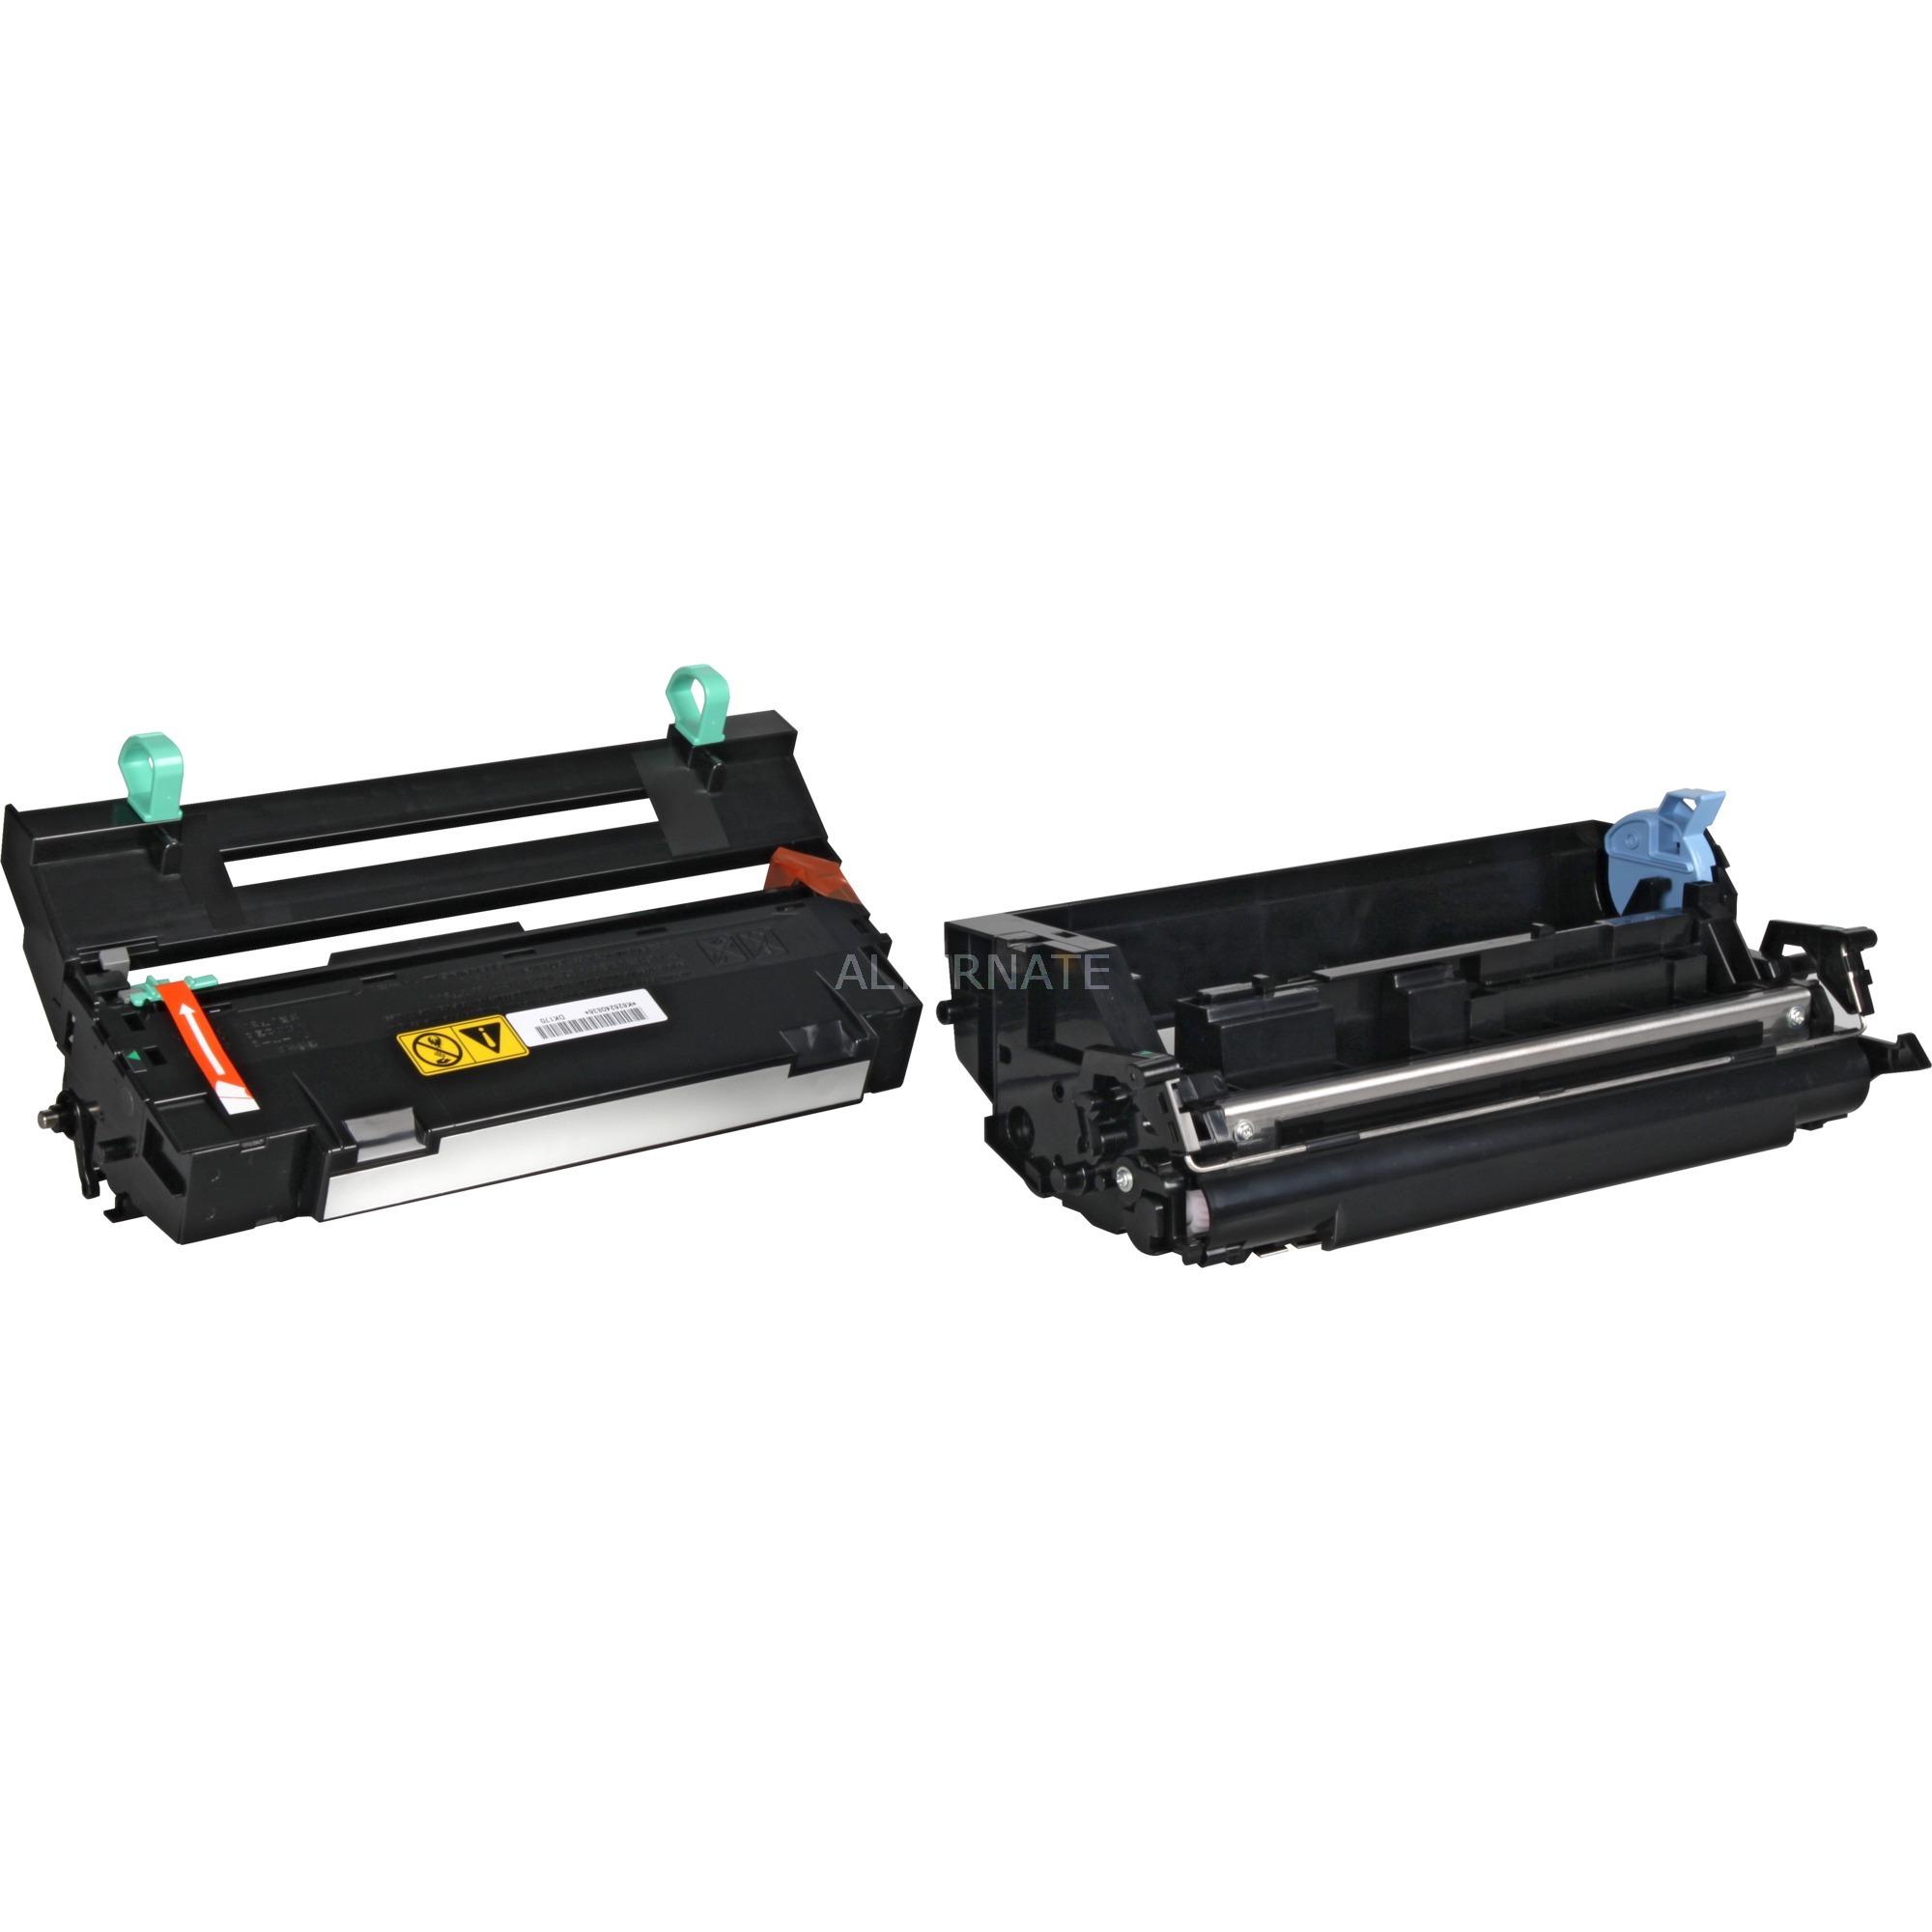 MK-170 Kit para impresoras, Módulo de extensión